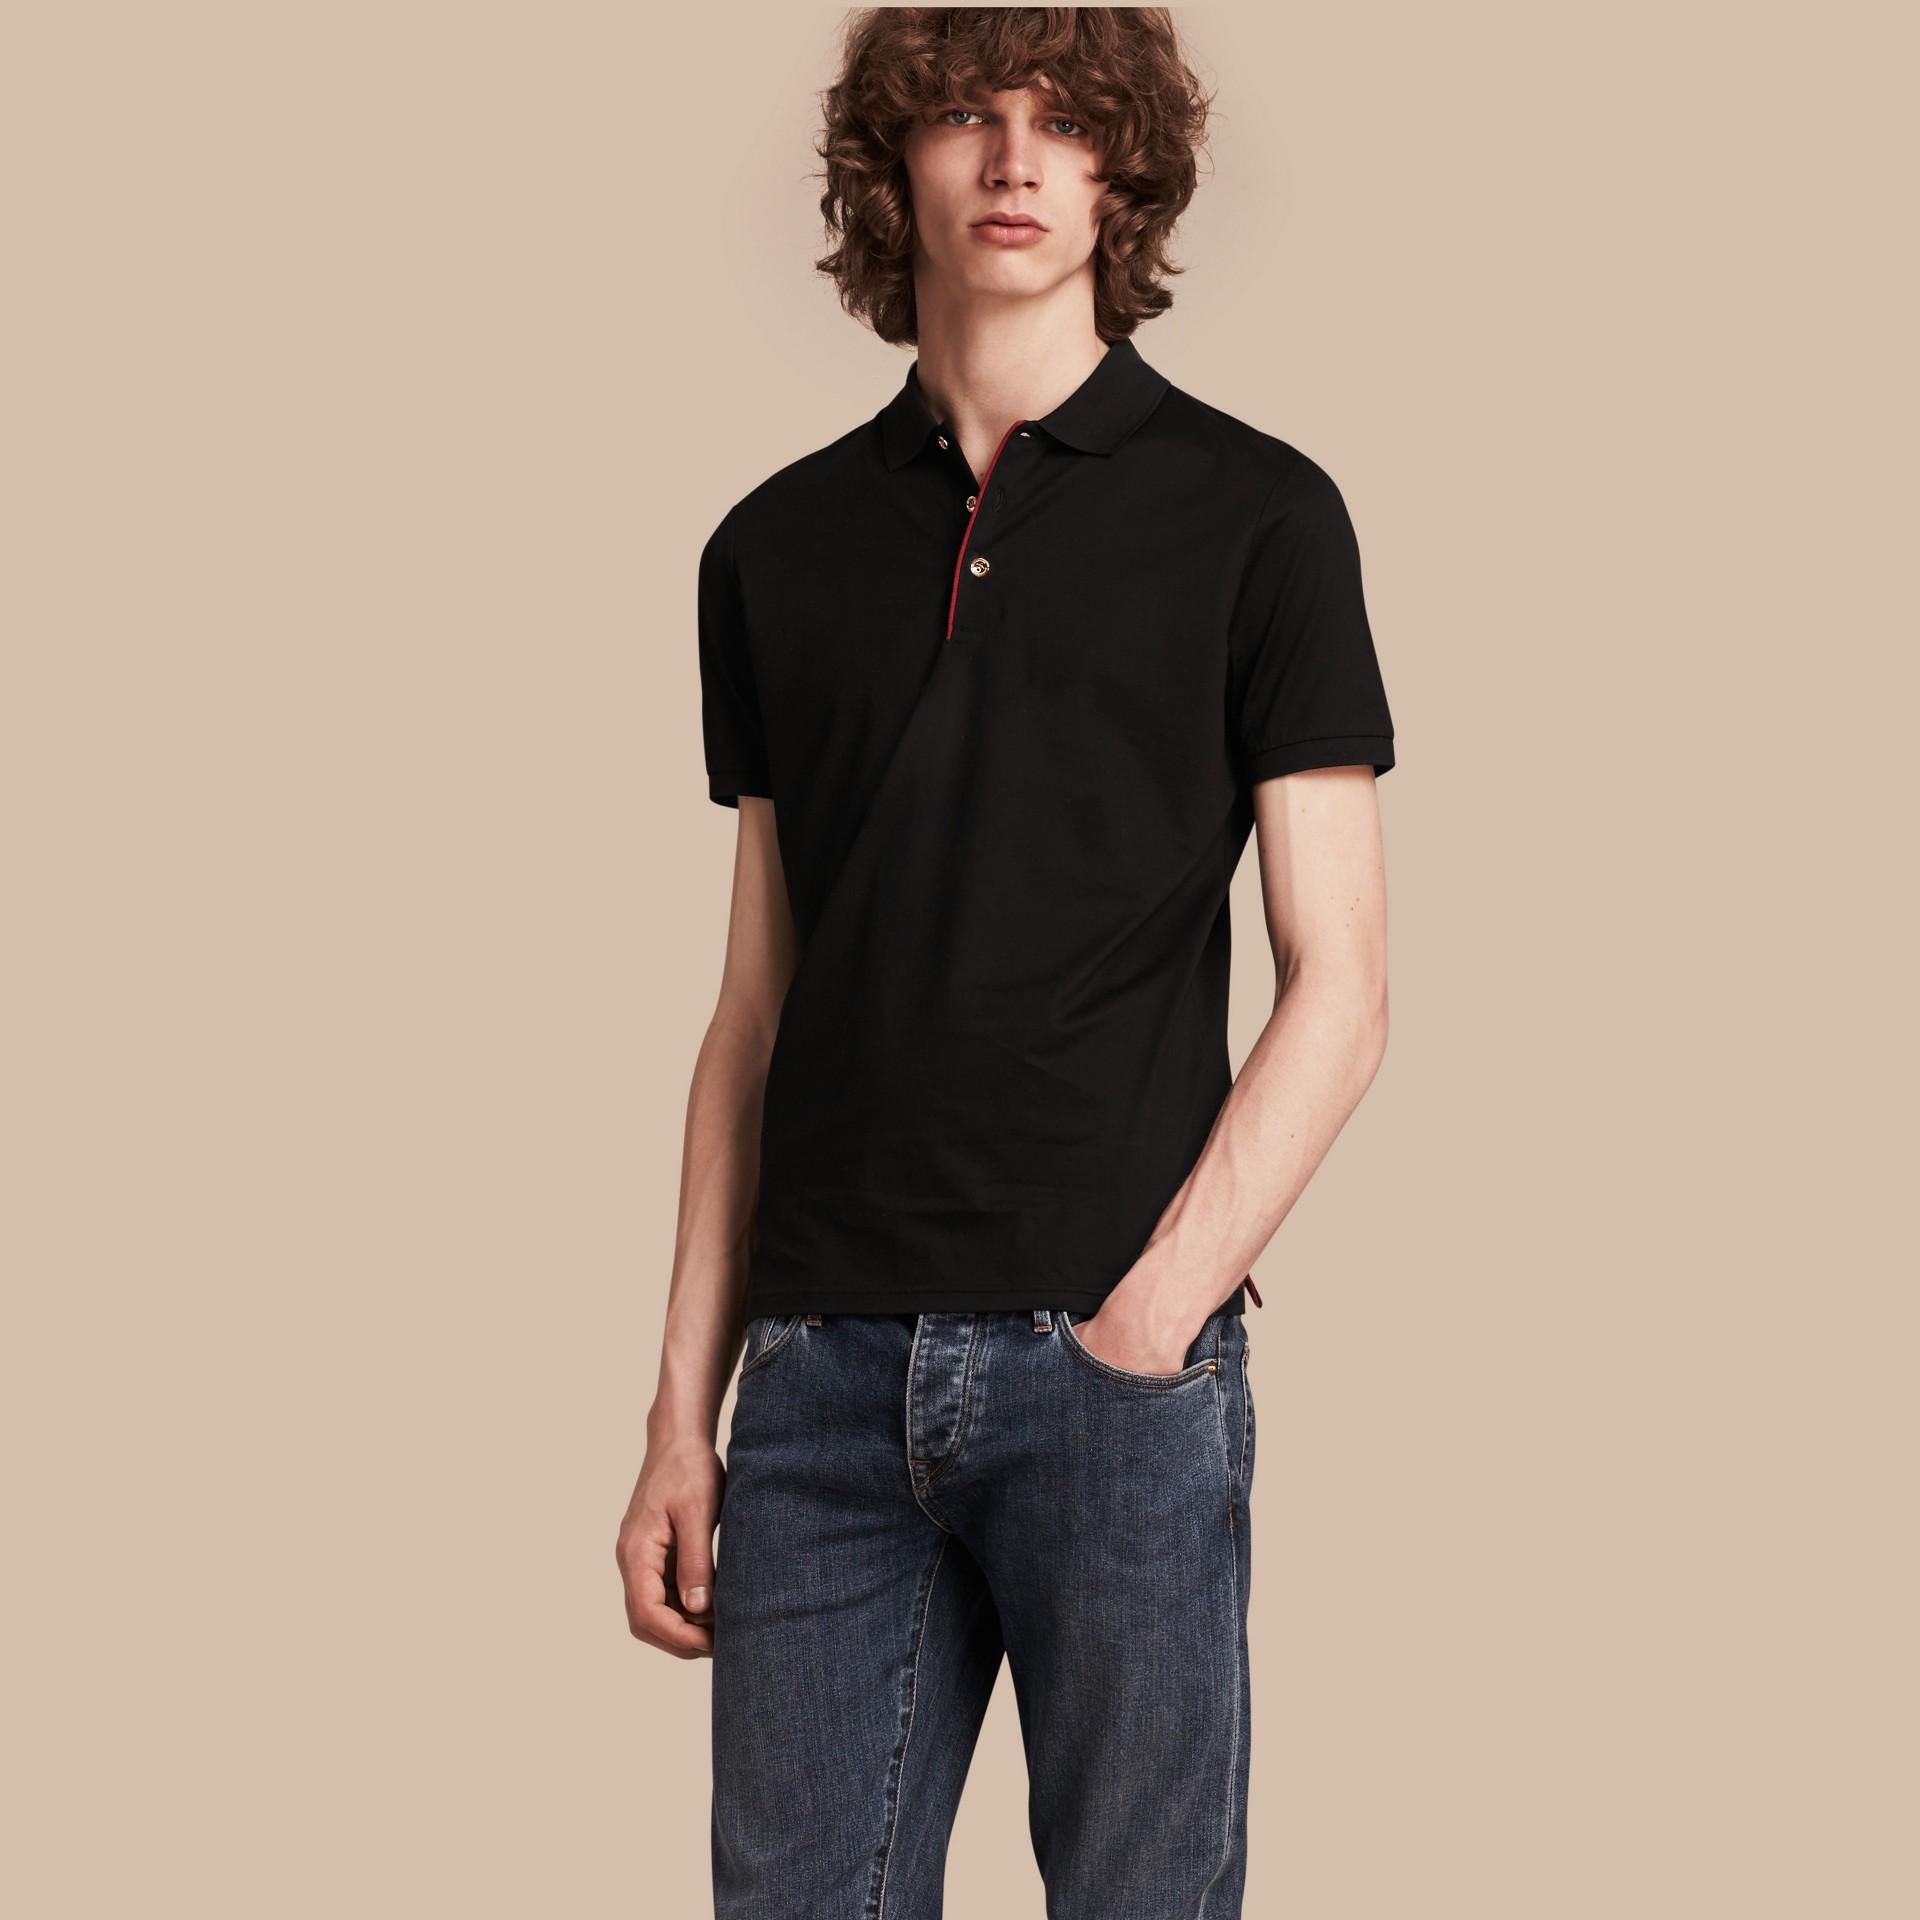 Black Regimental Cotton Polo Shirt Black - gallery image 1